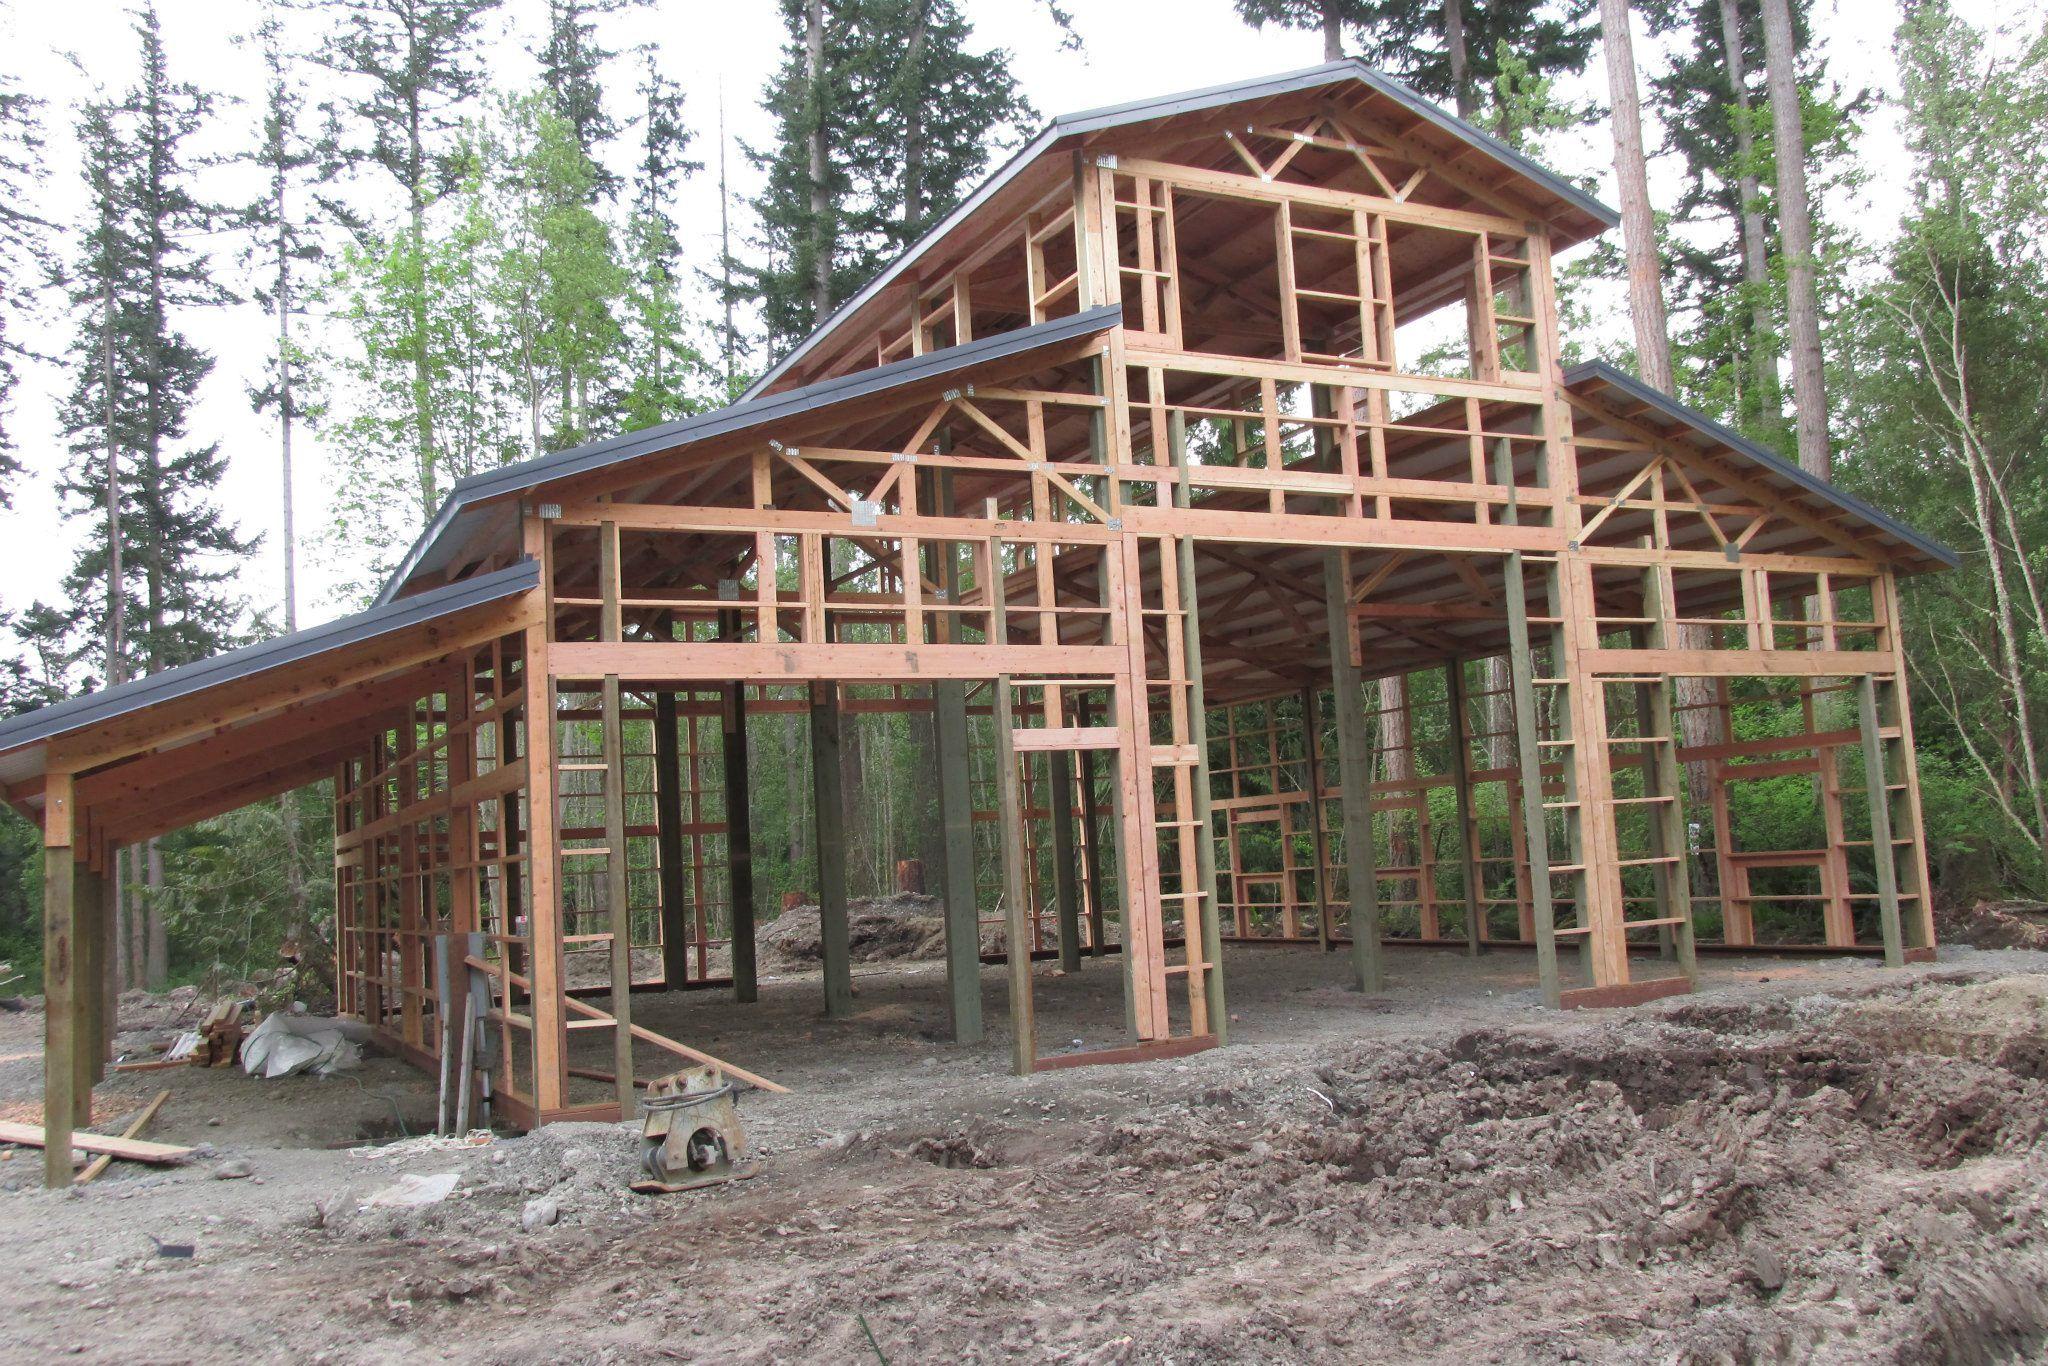 Monitor-style Barn In Progress Anacortes Wa. Constru